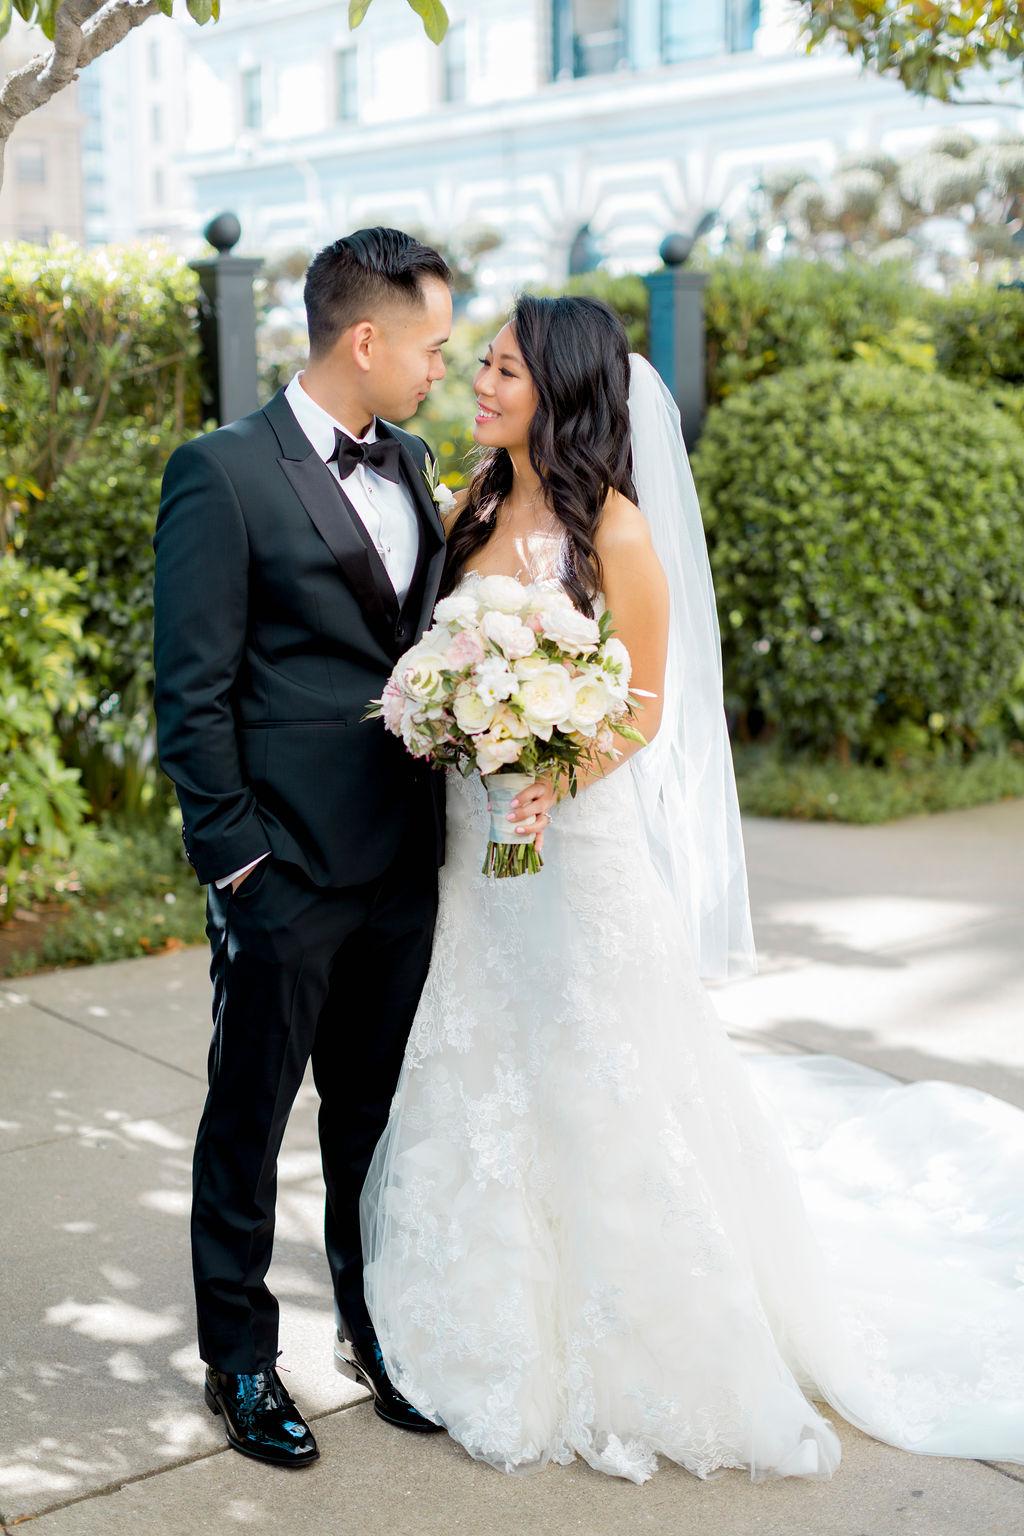 The Fairmont San Francisco Wedding Christina Jj Details Details Weddings And Events